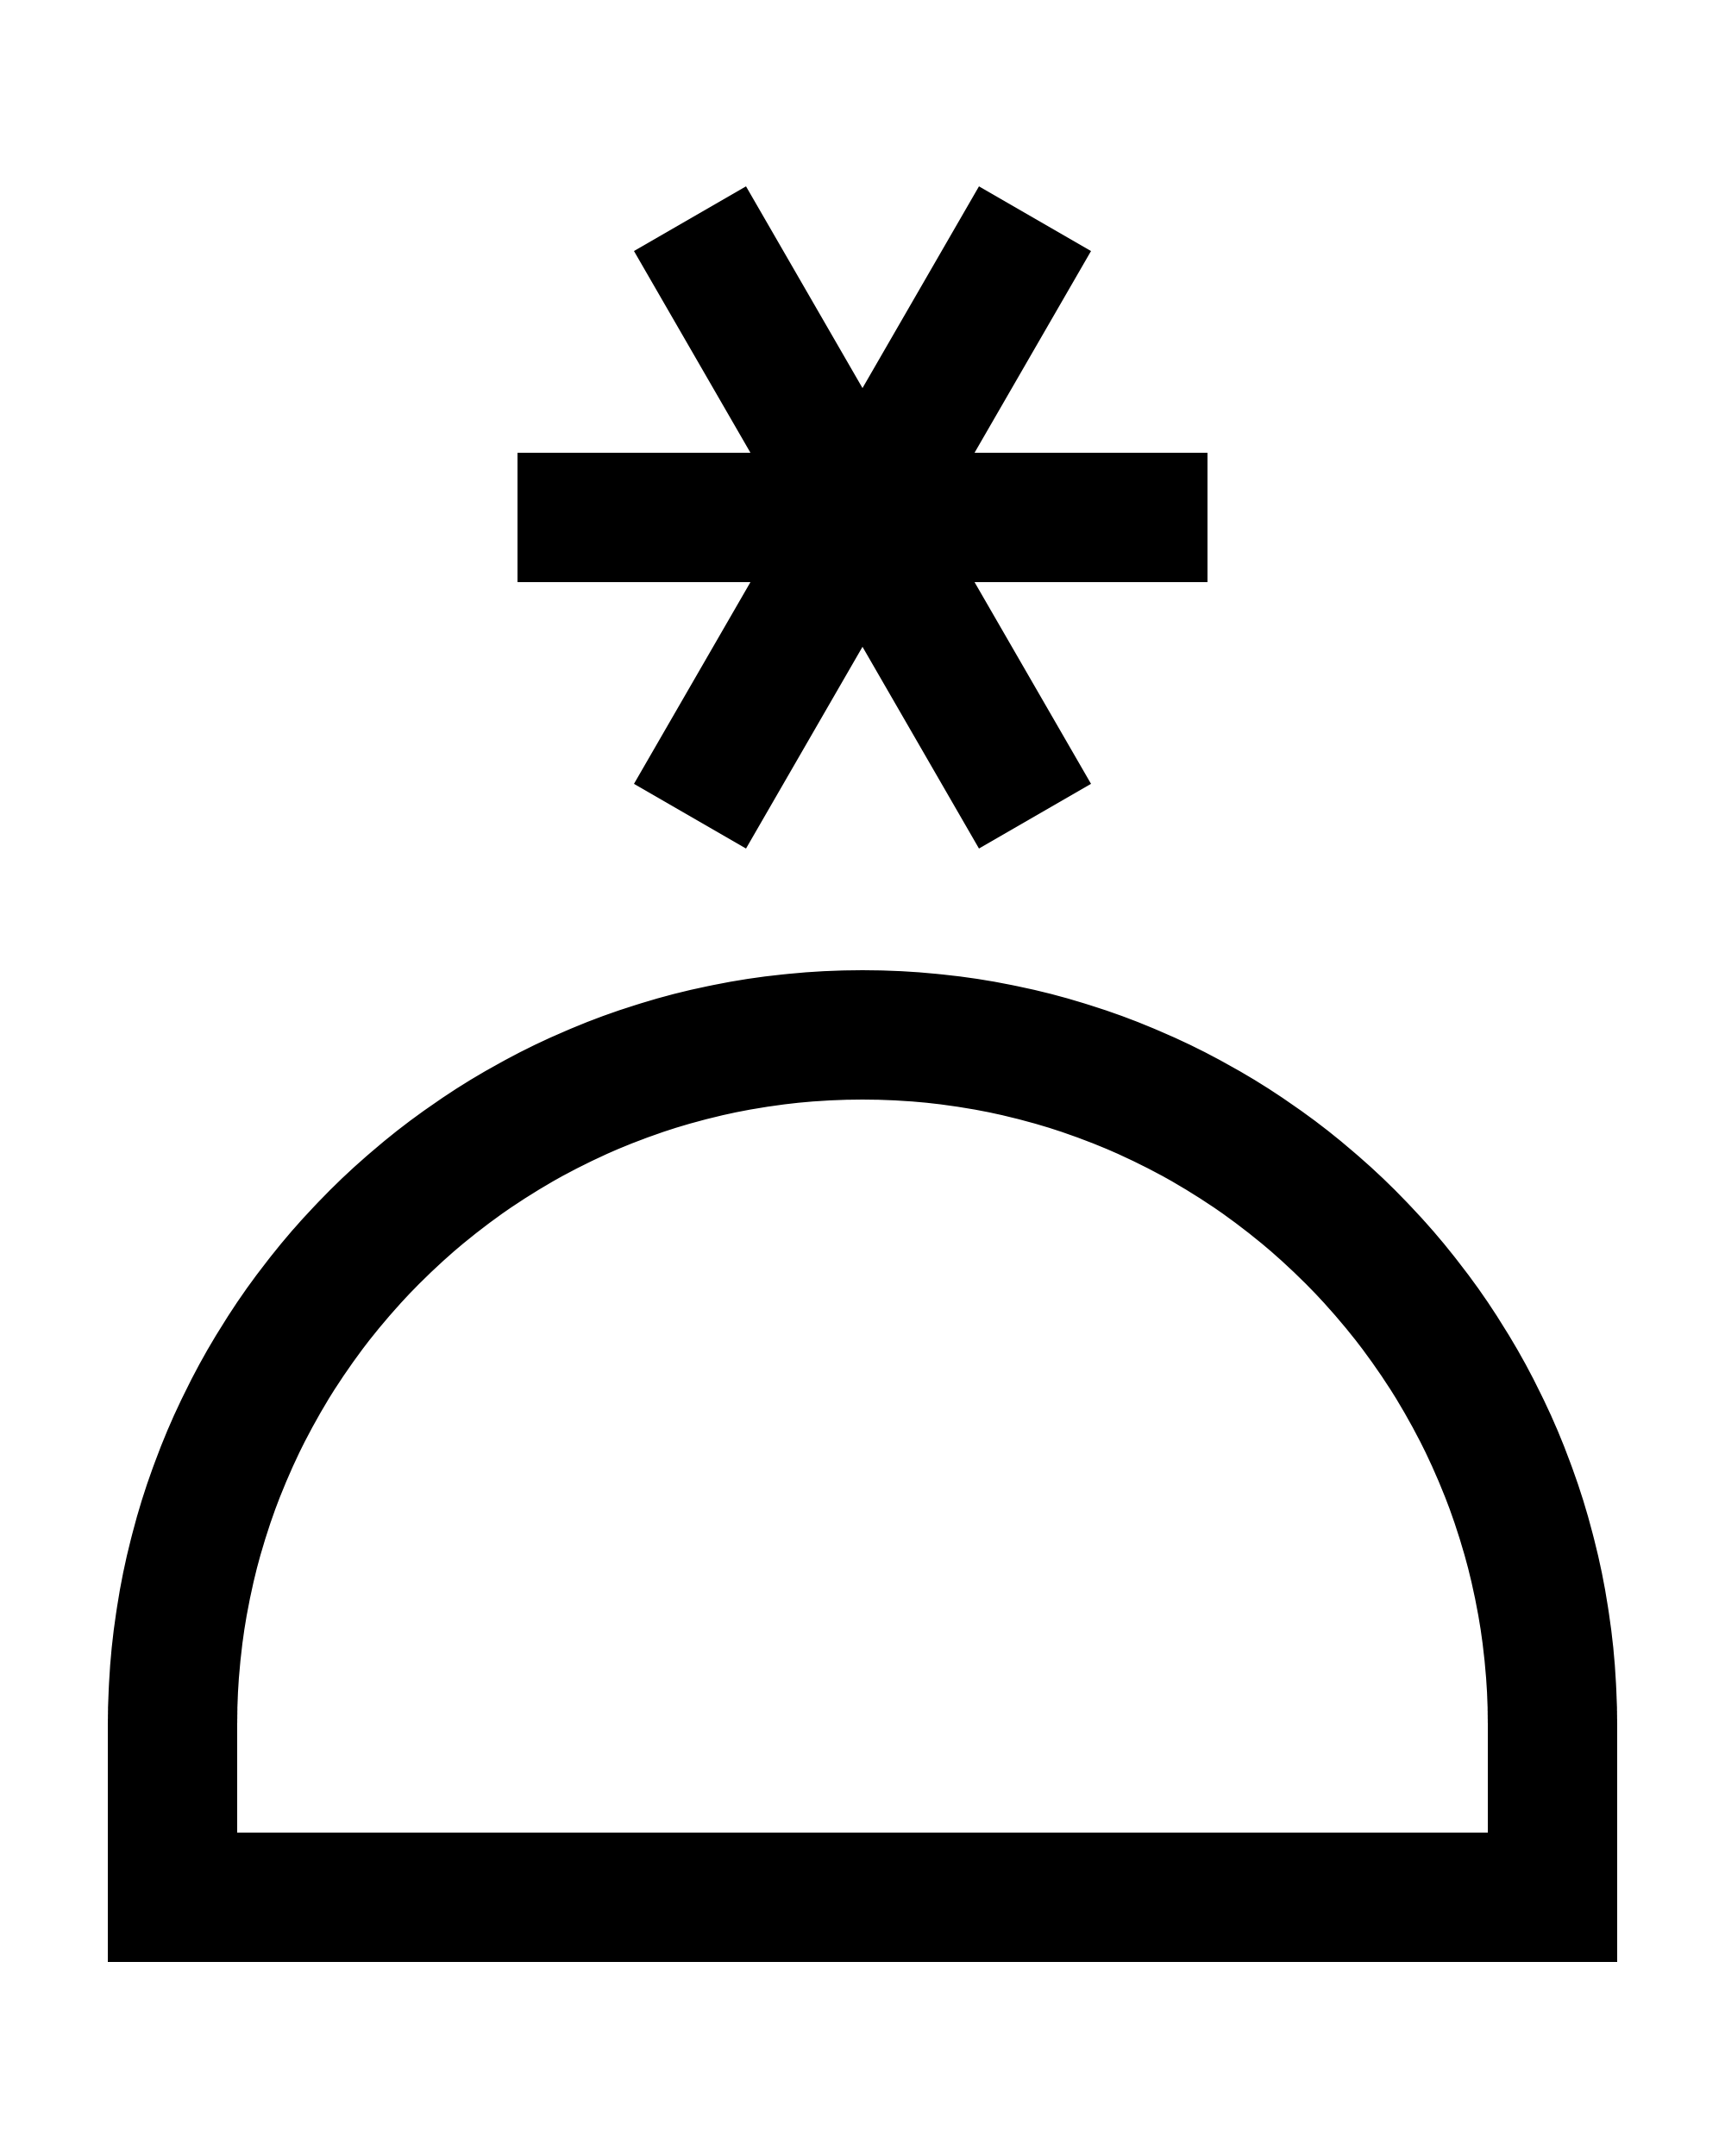 2000px-16_Psyche_symbol.svg.png